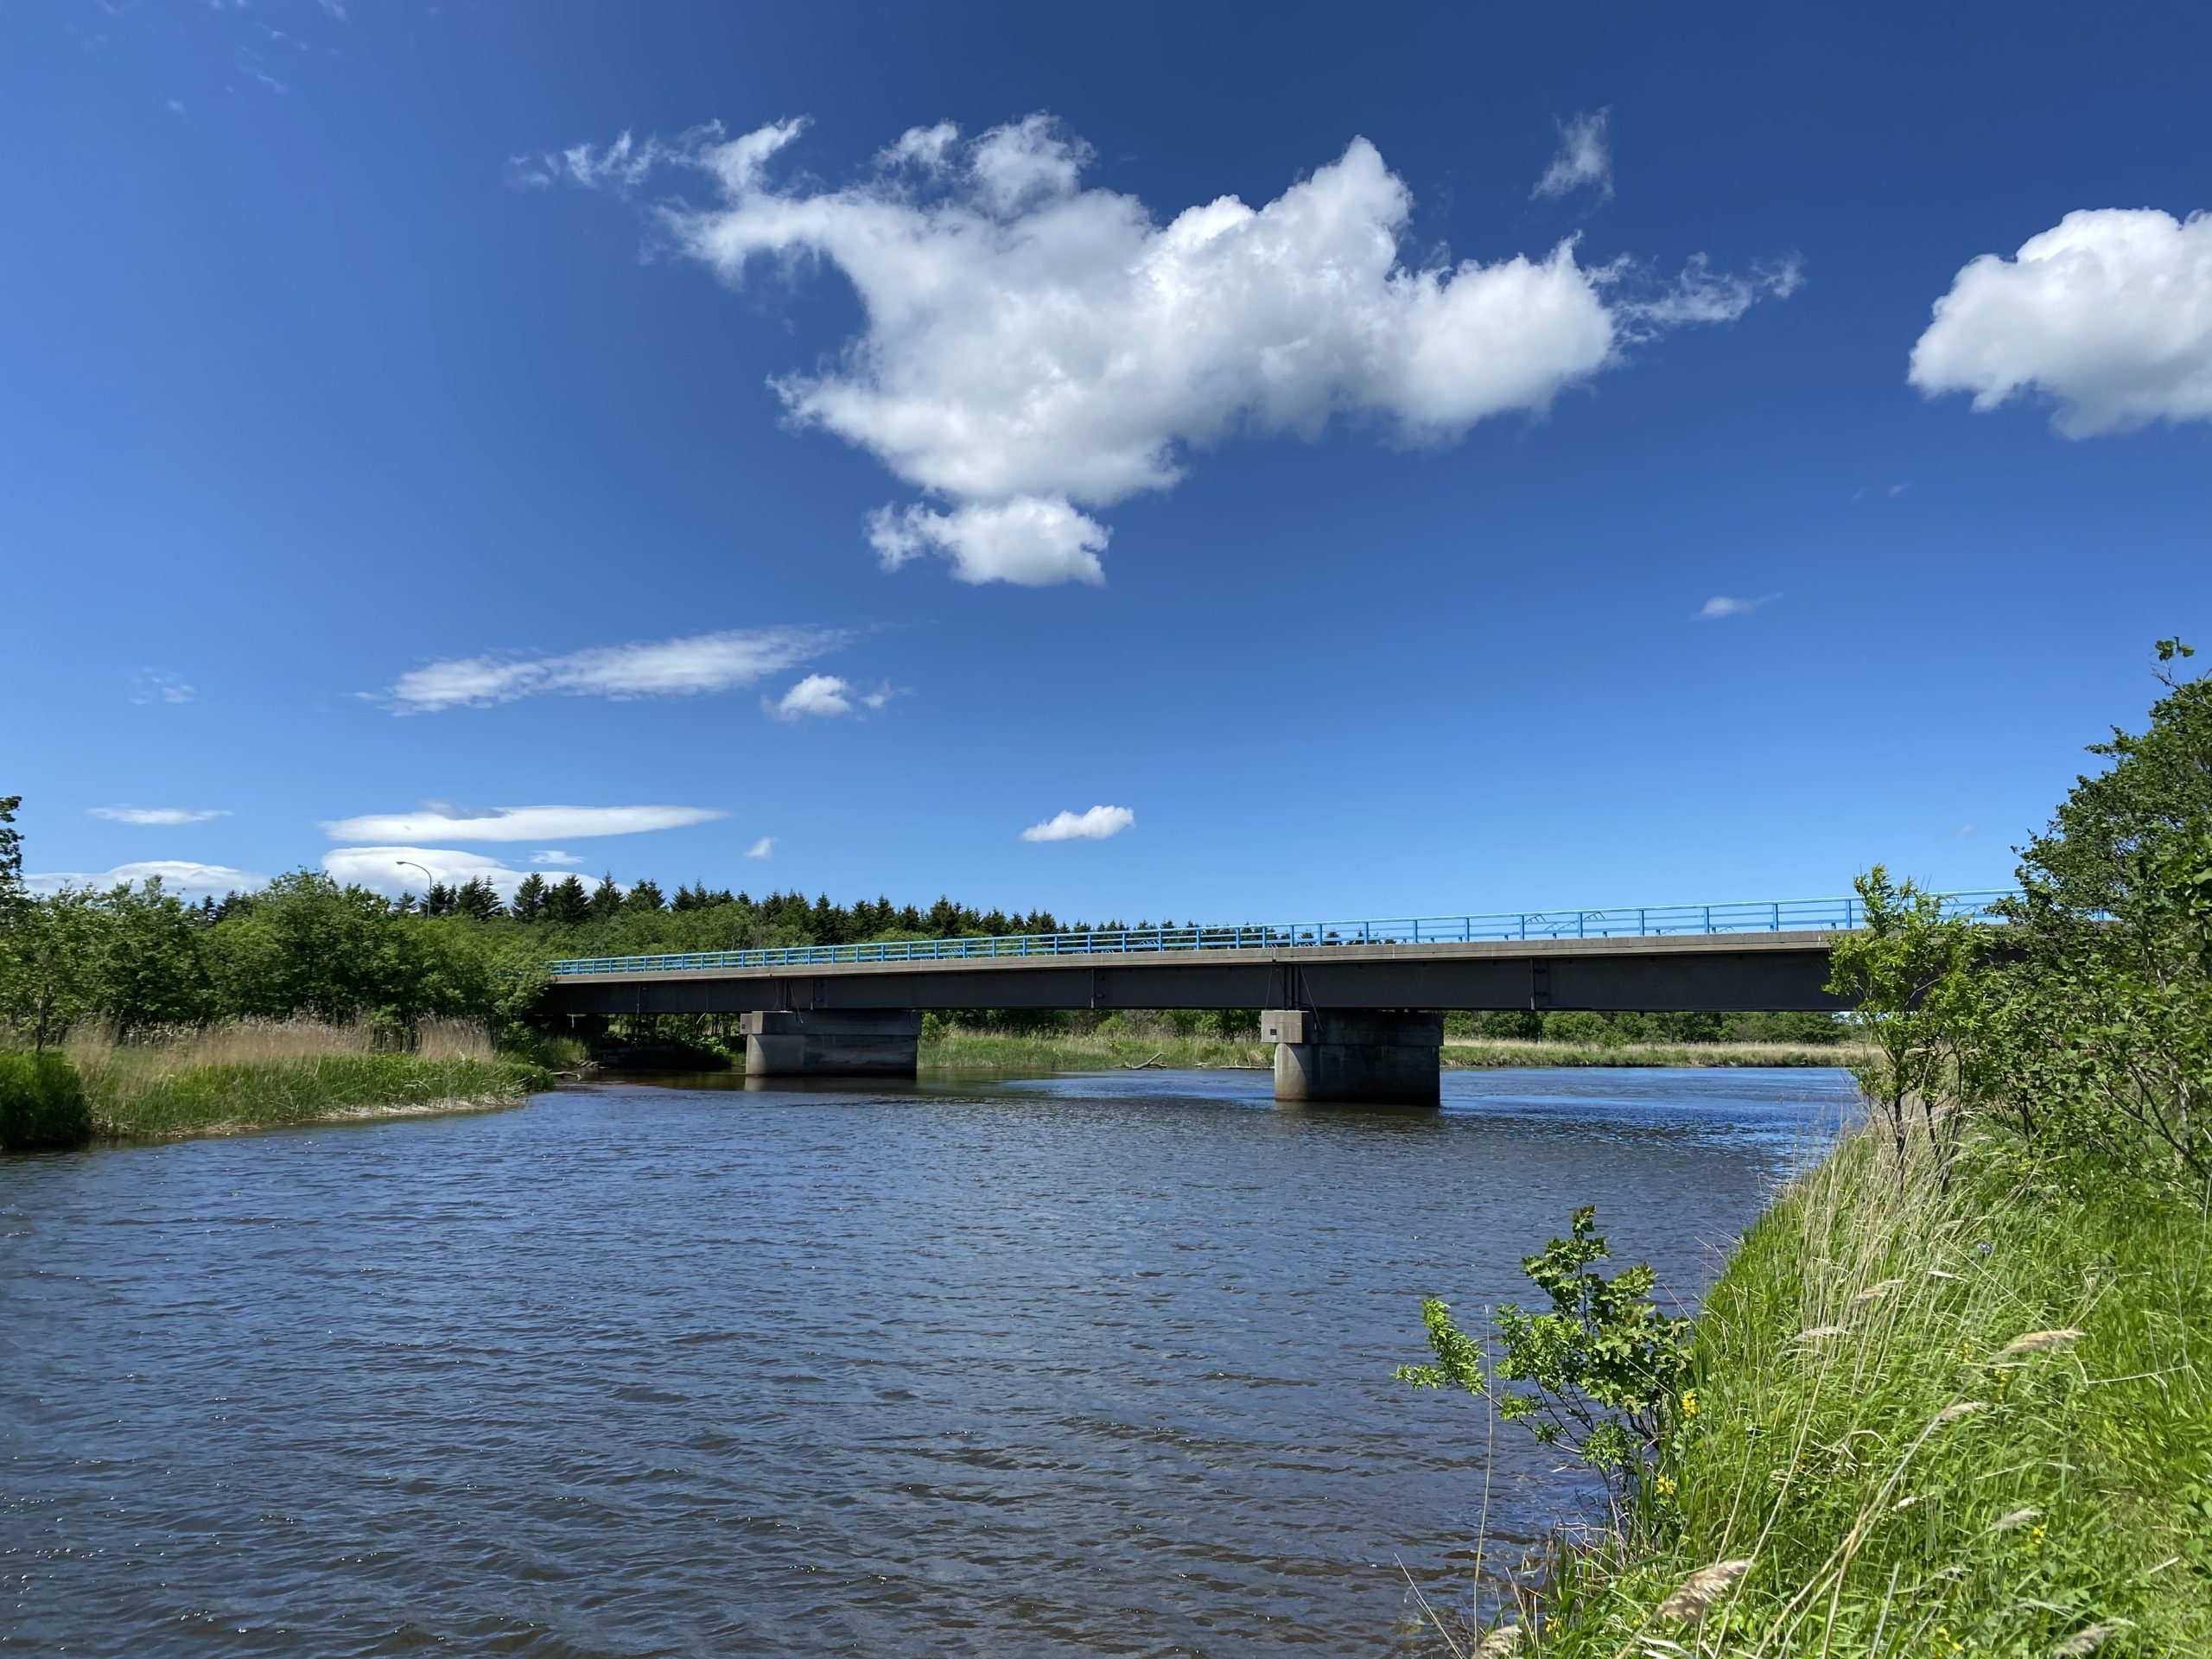 猿払川 猿払橋